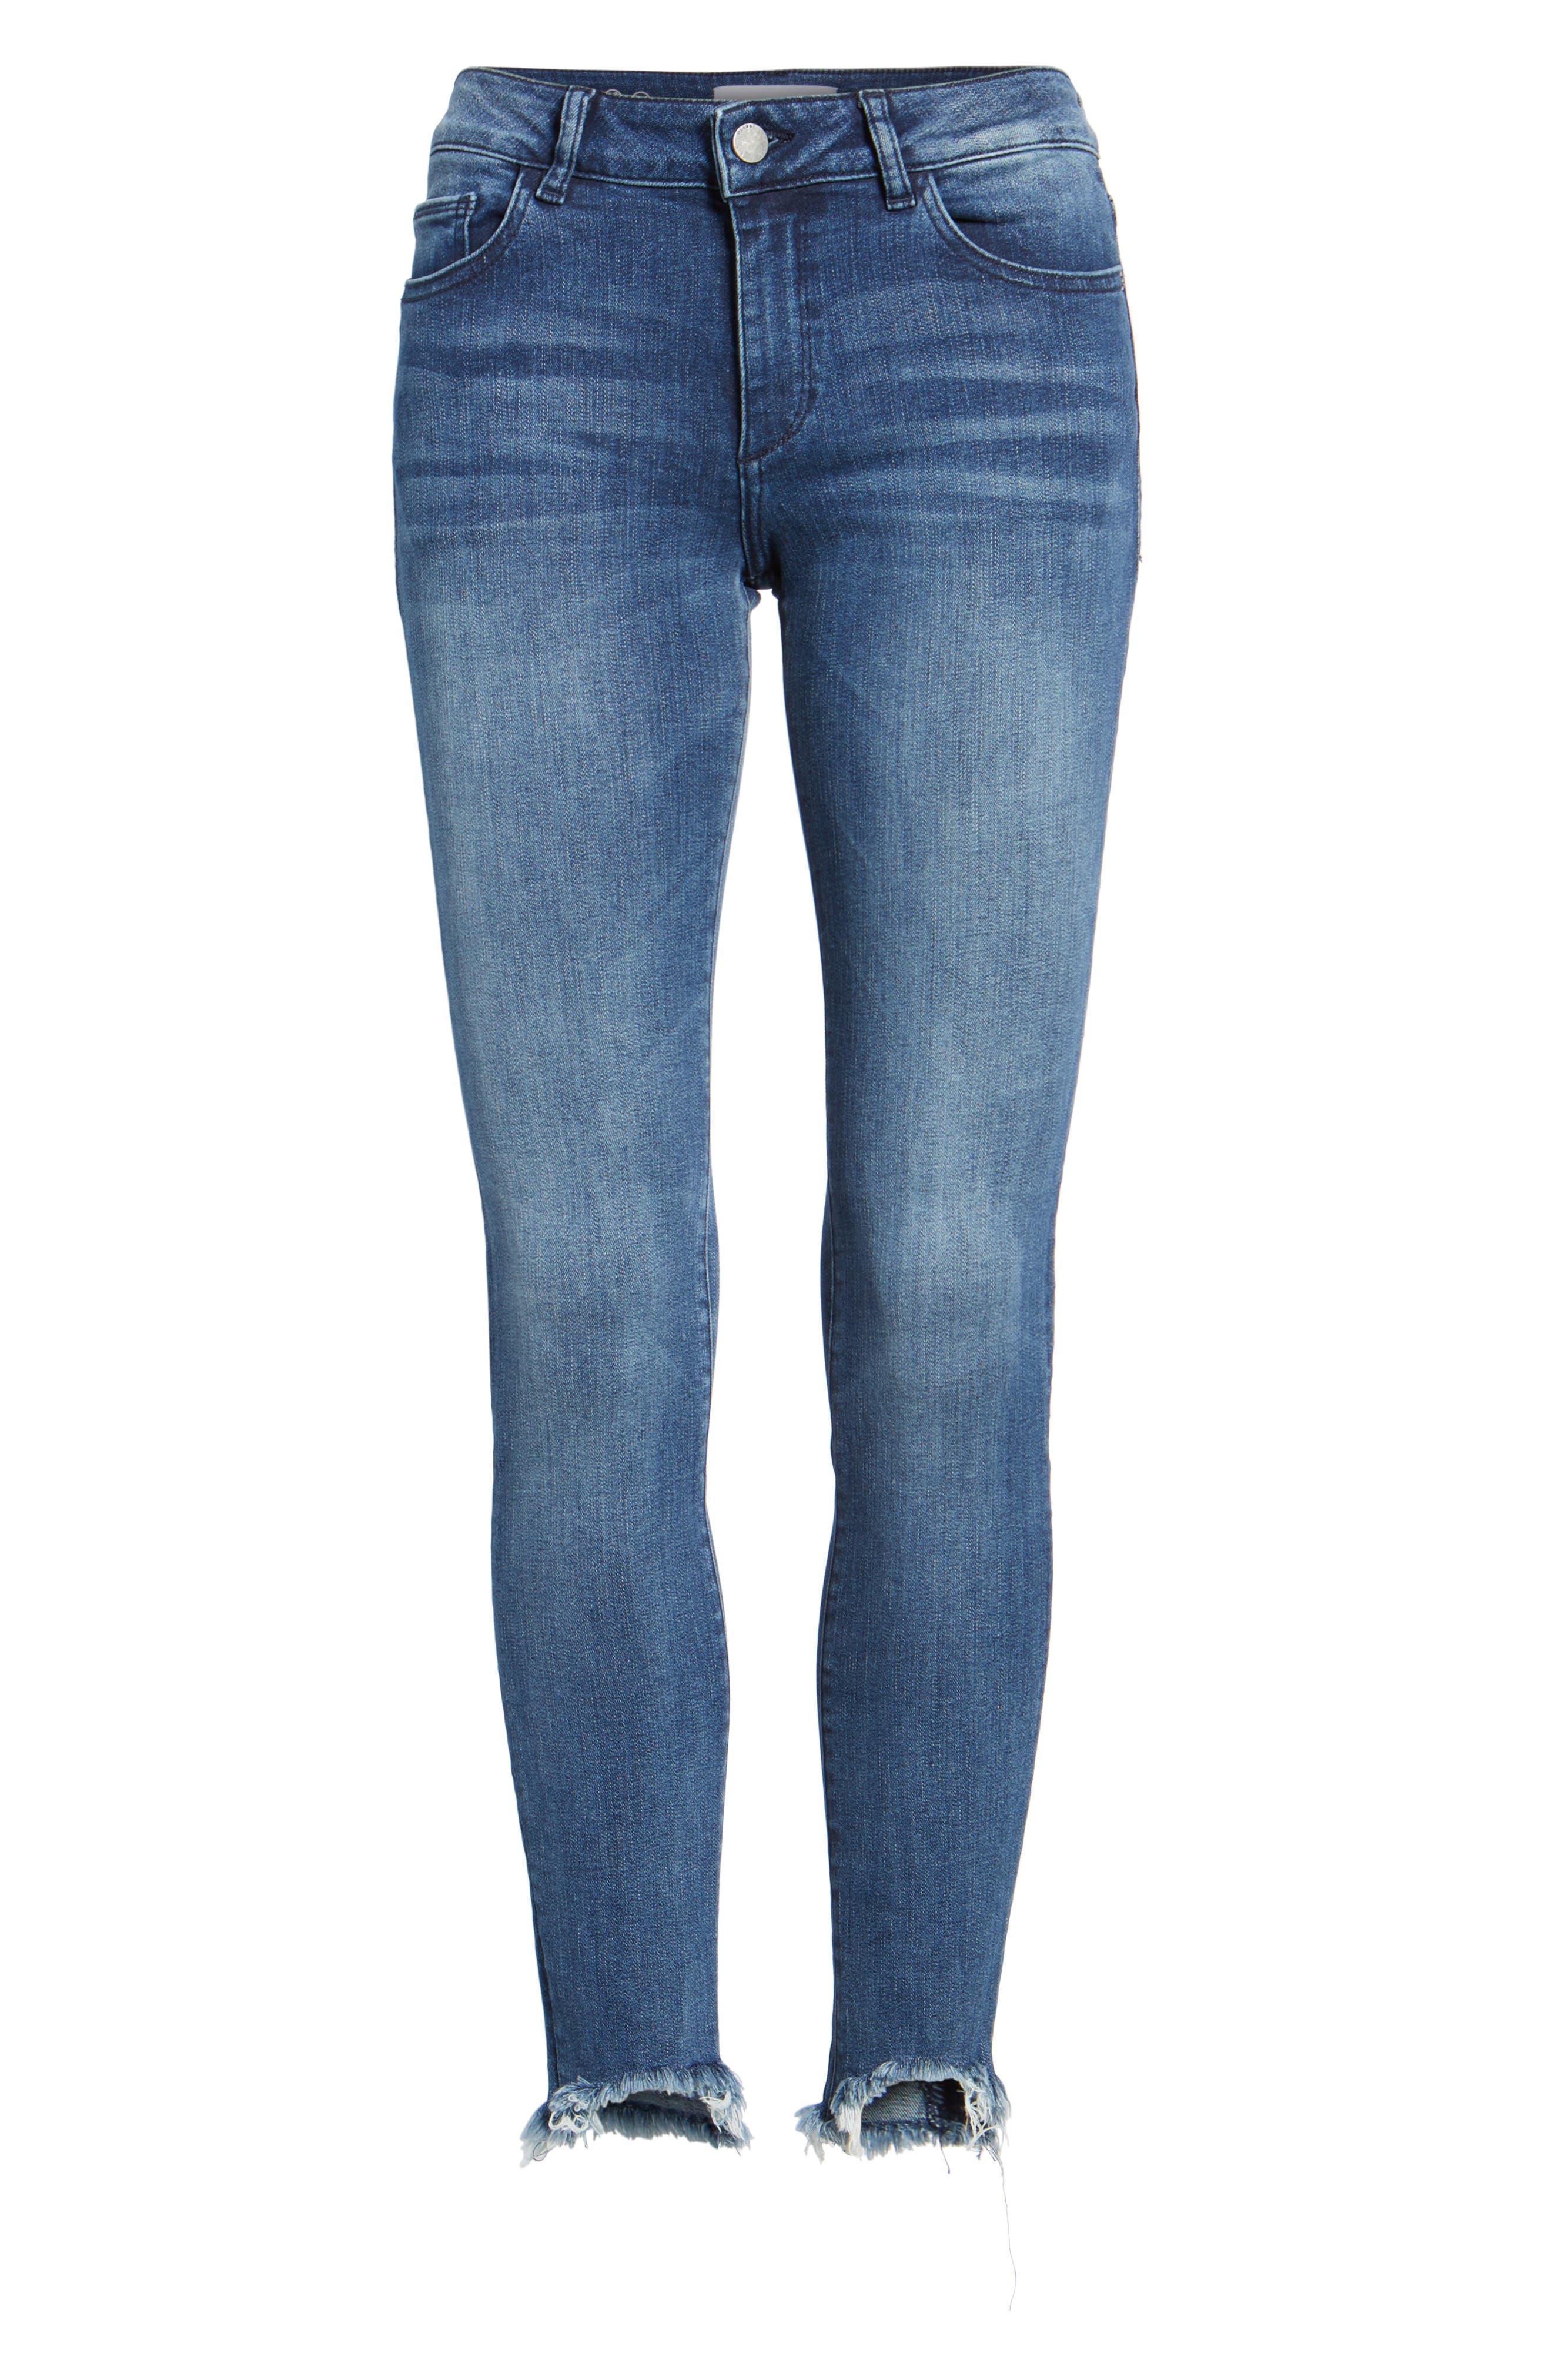 Emma Power Legging Jeans,                             Alternate thumbnail 7, color,                             425